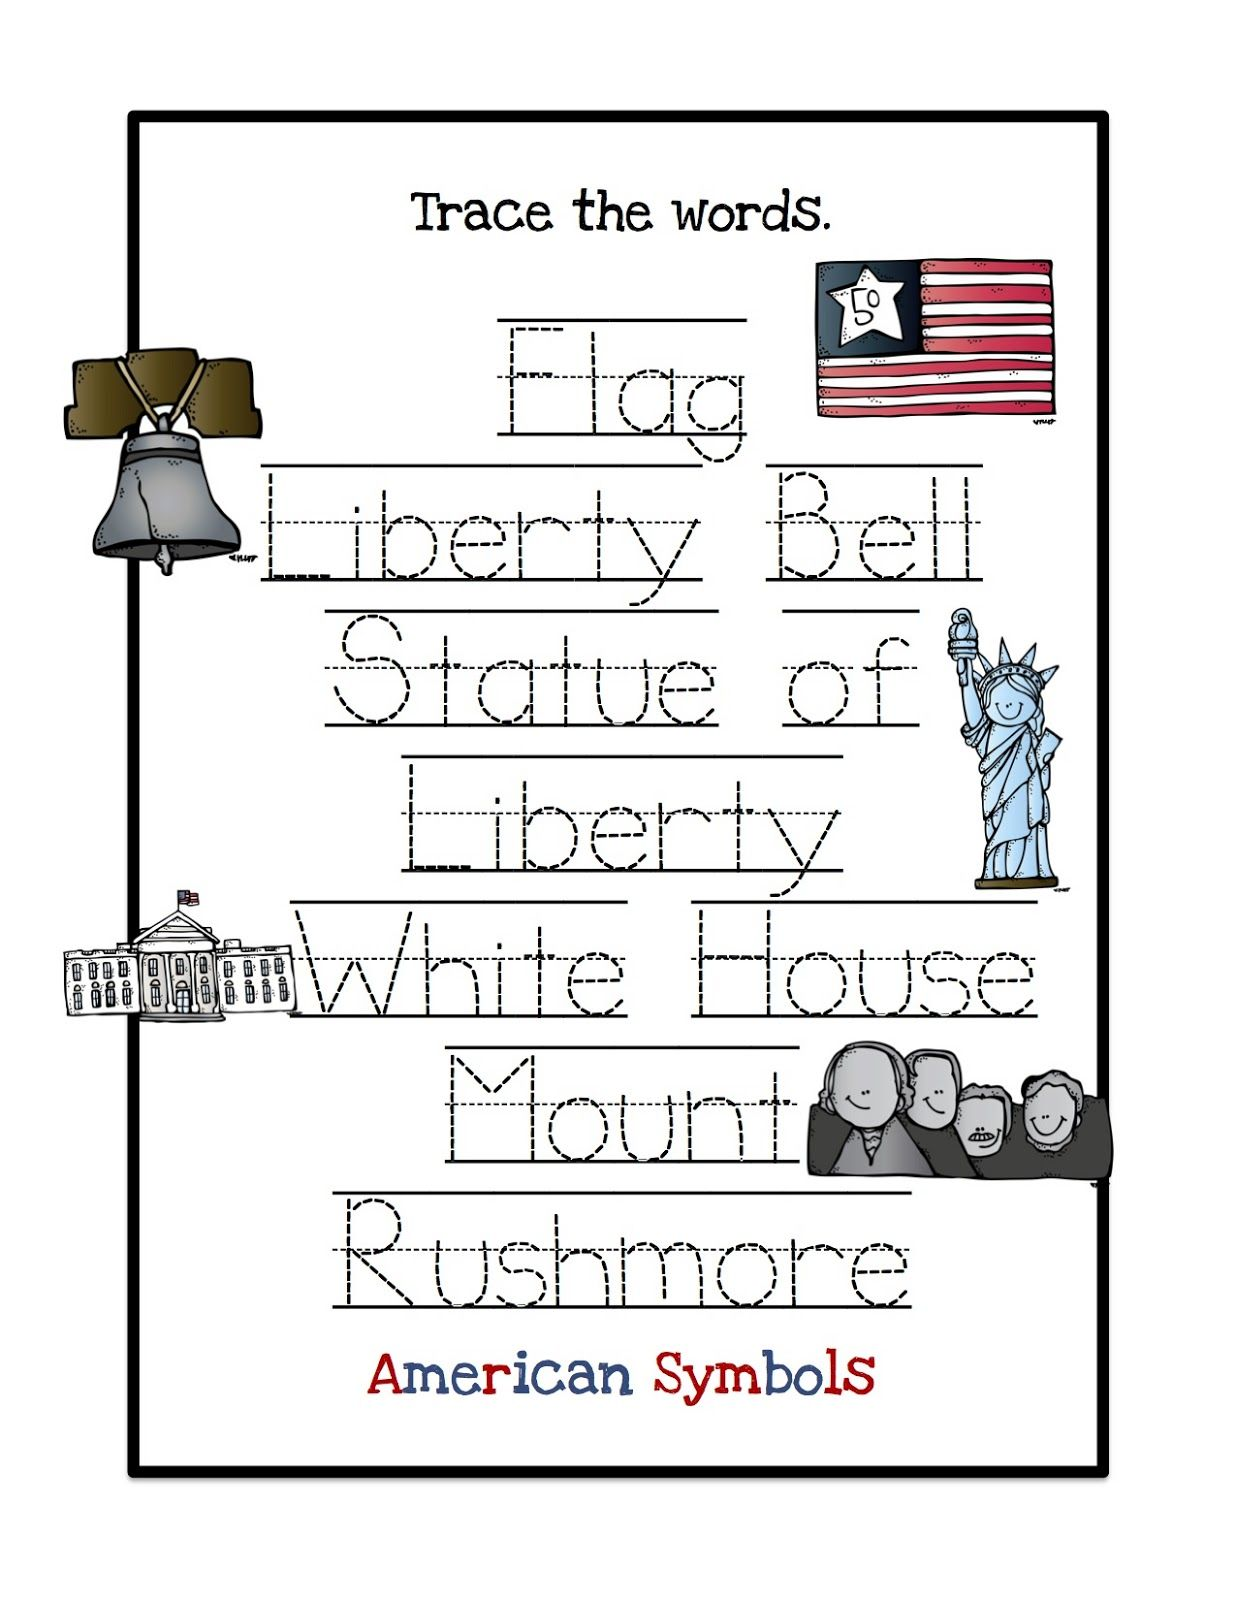 medium resolution of Nat'l symbols word trace   American symbols